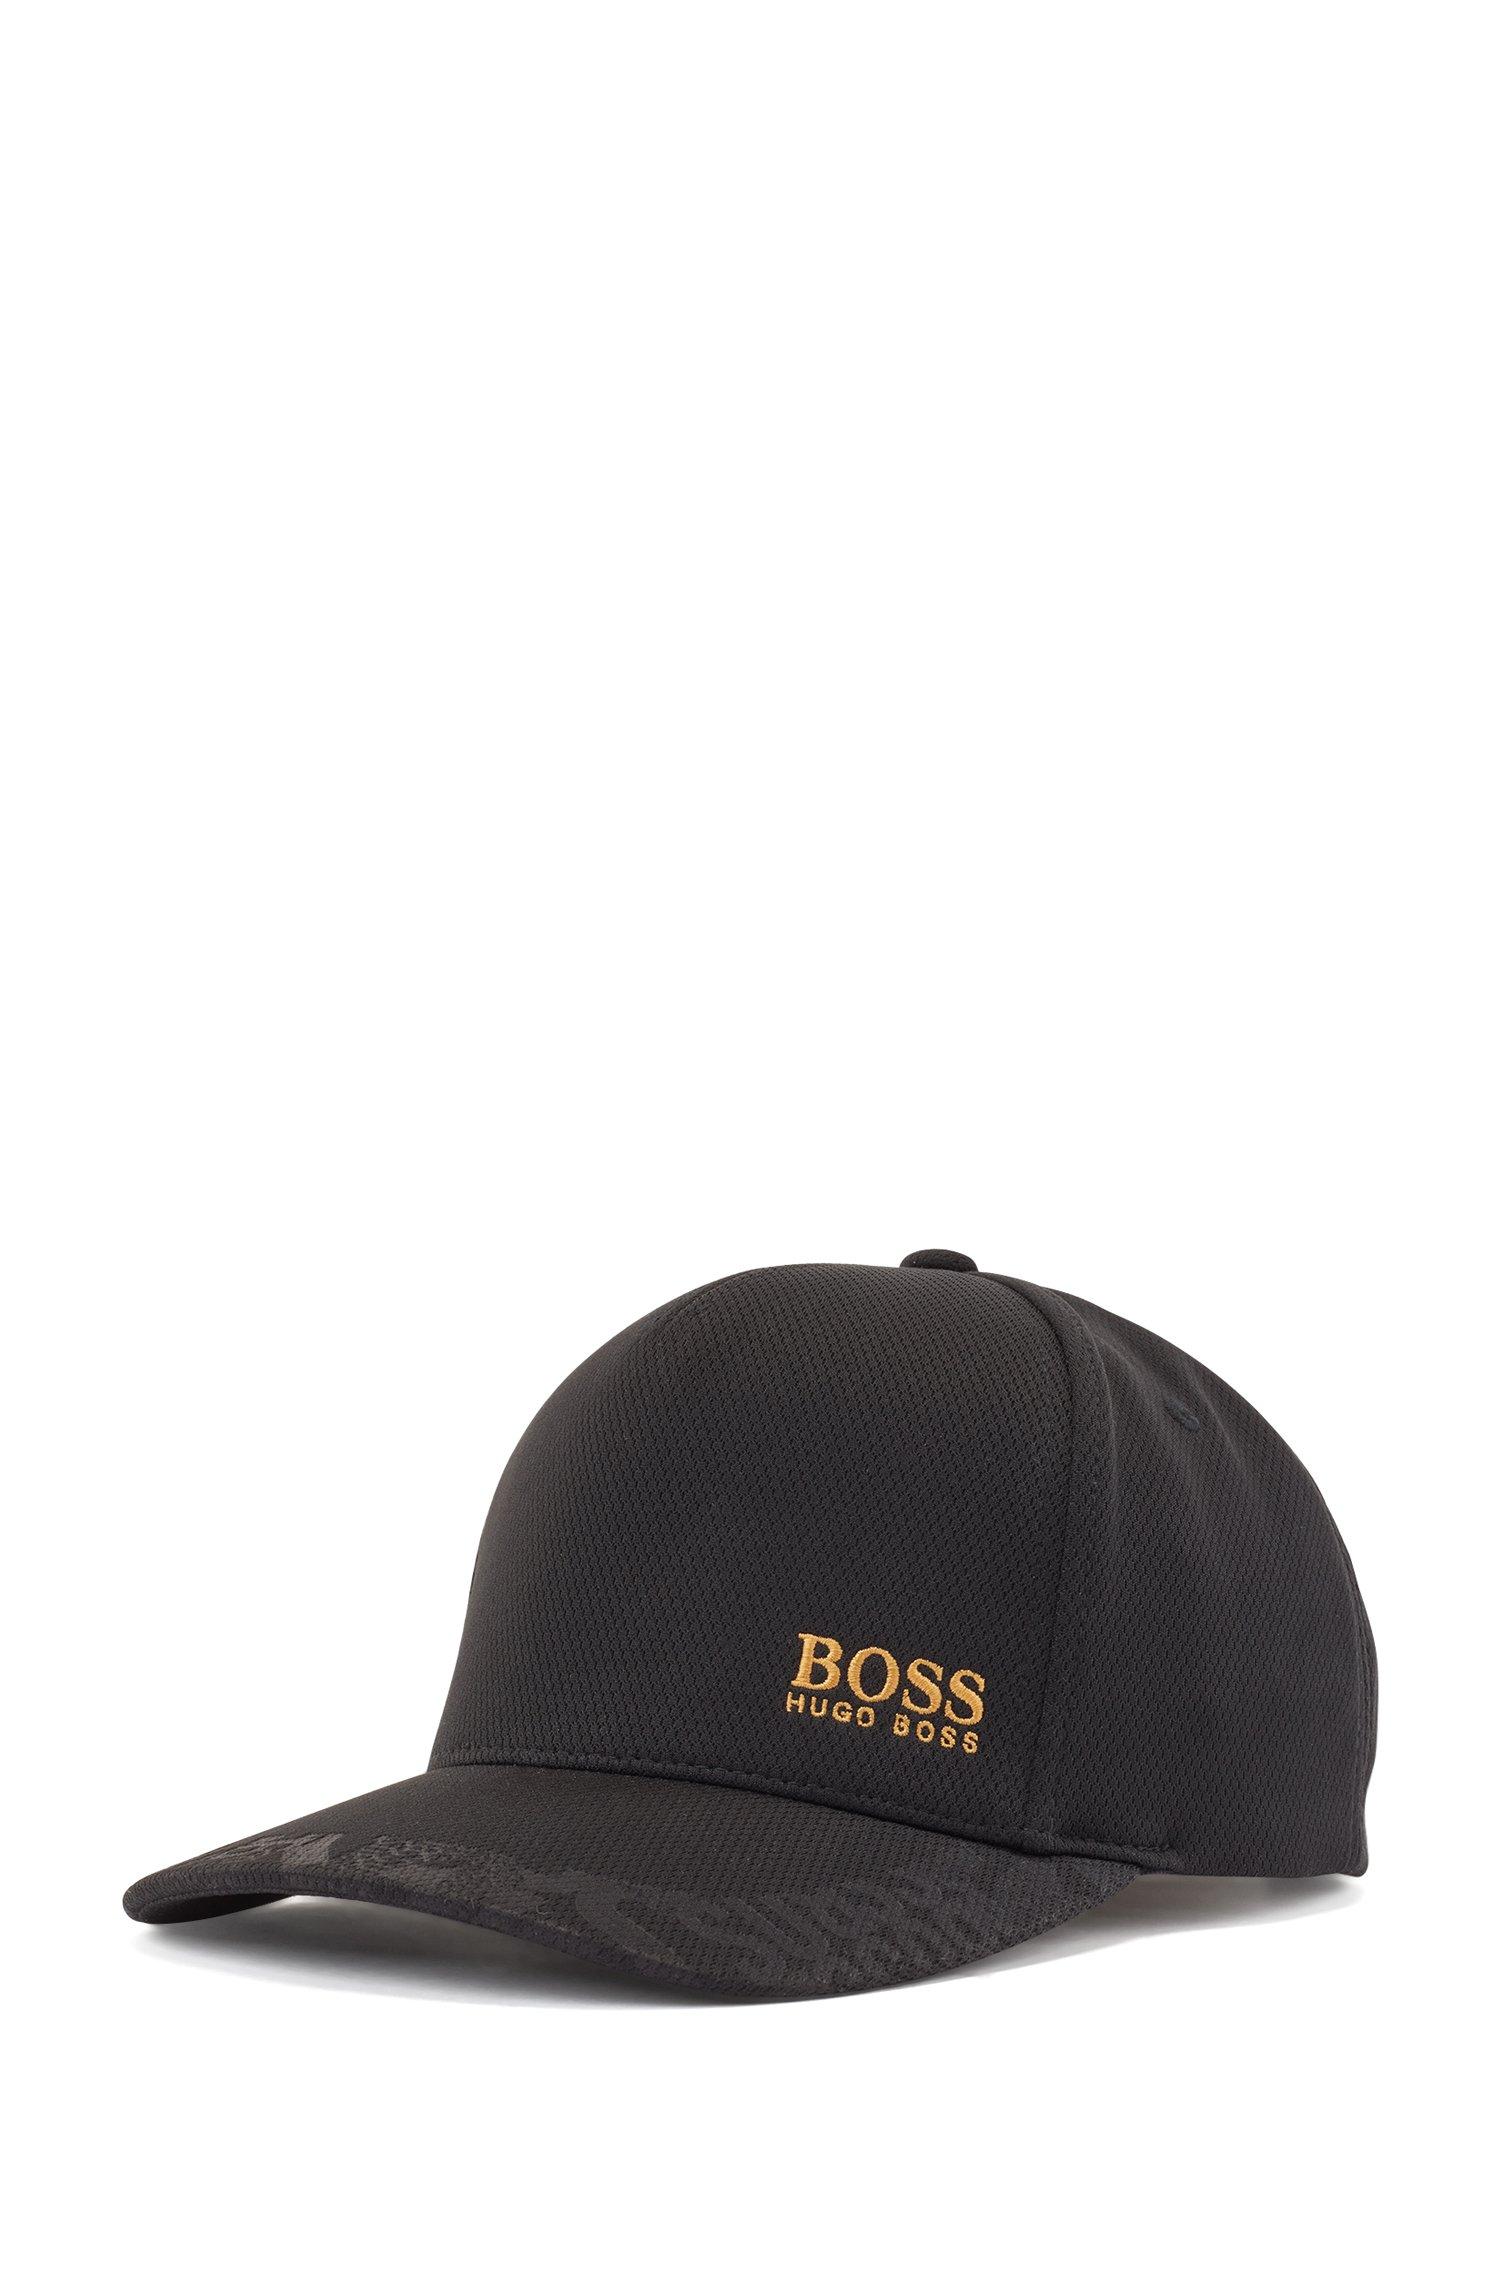 Honeycomb-jersey cap with gold-tone logo, Black